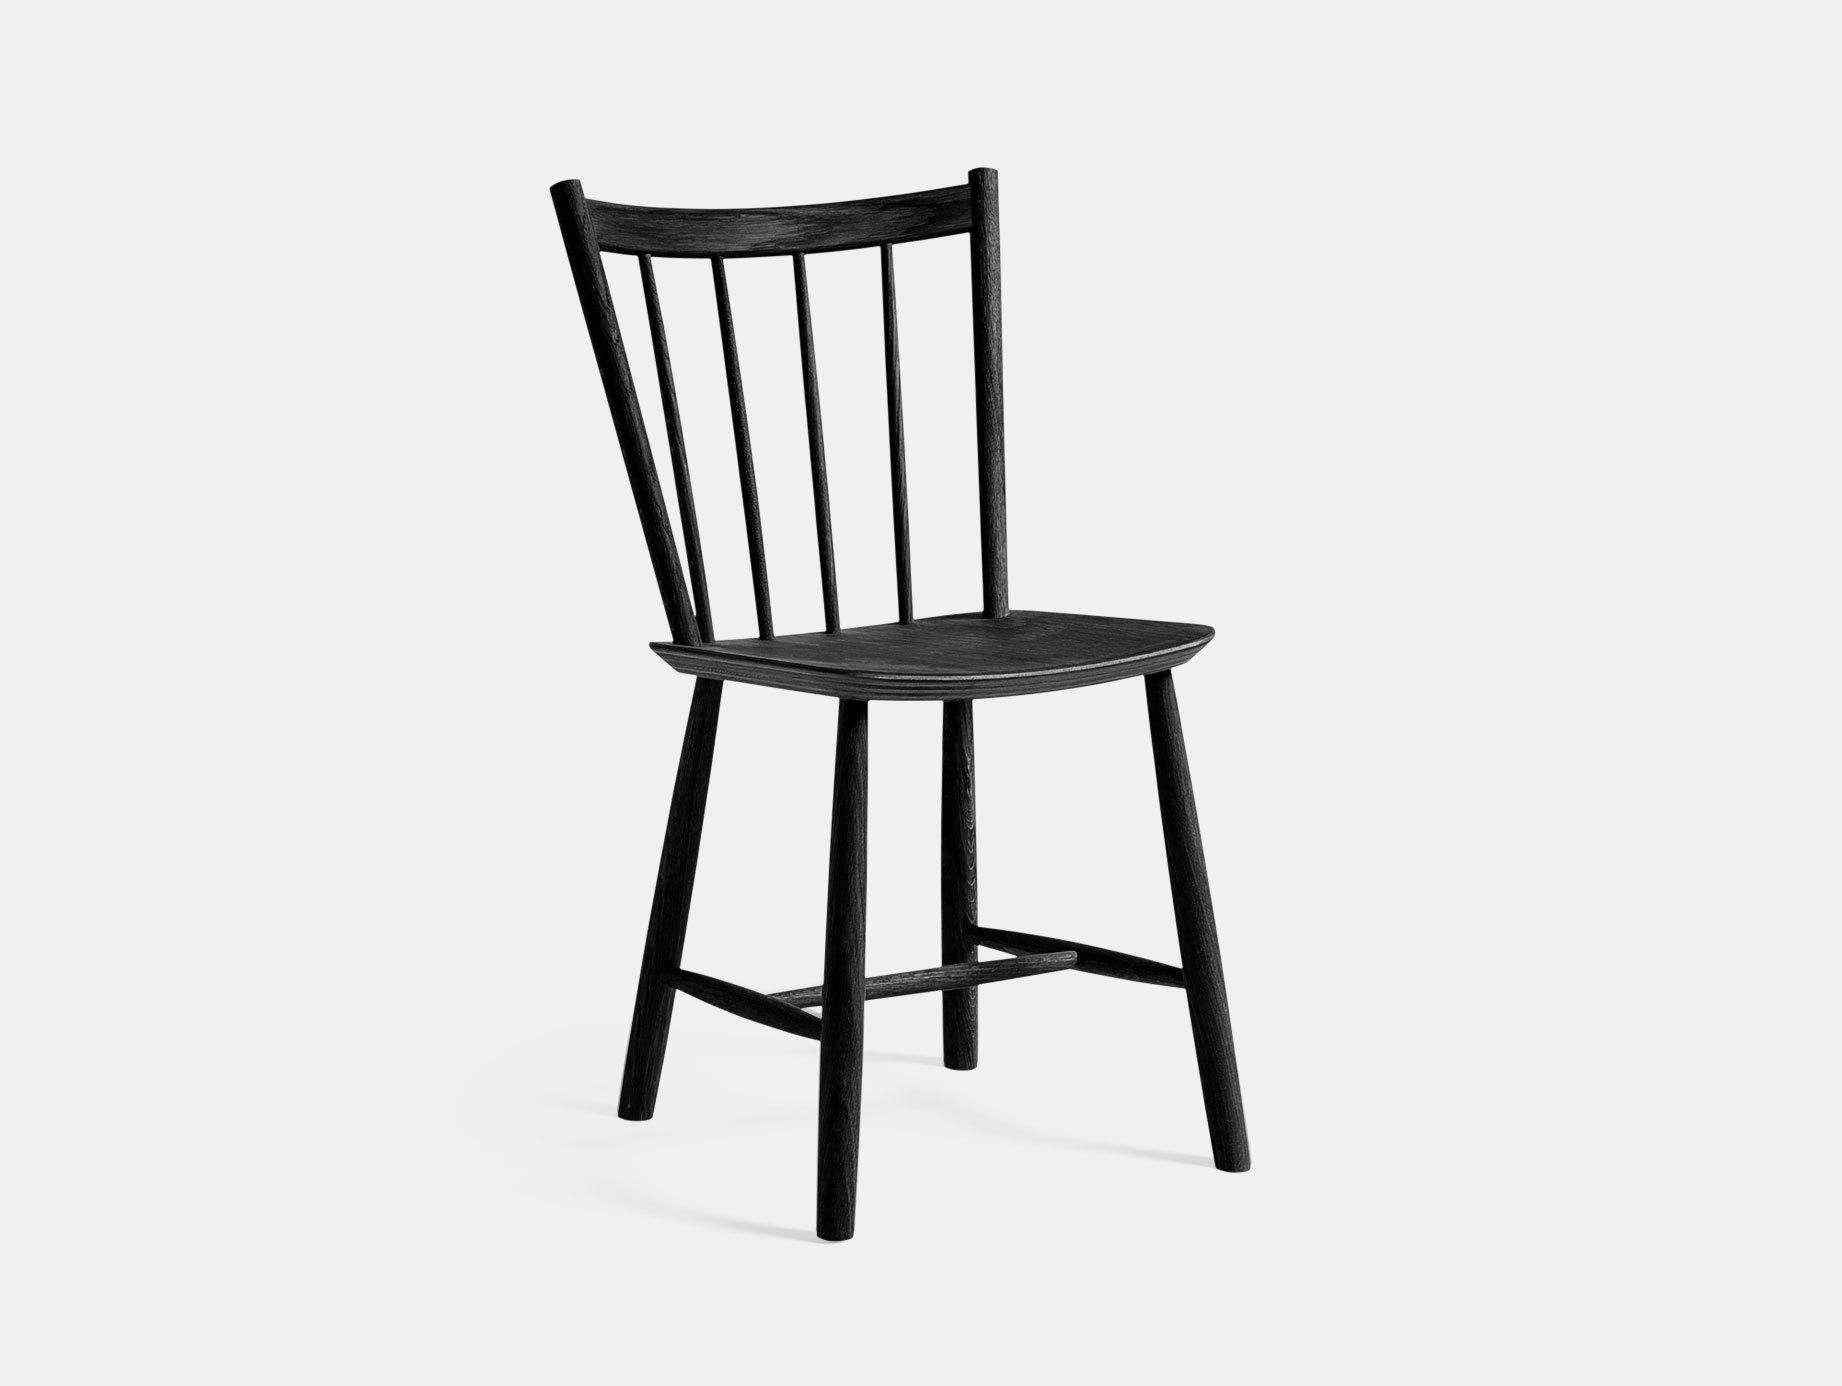 J41 Chair image 1